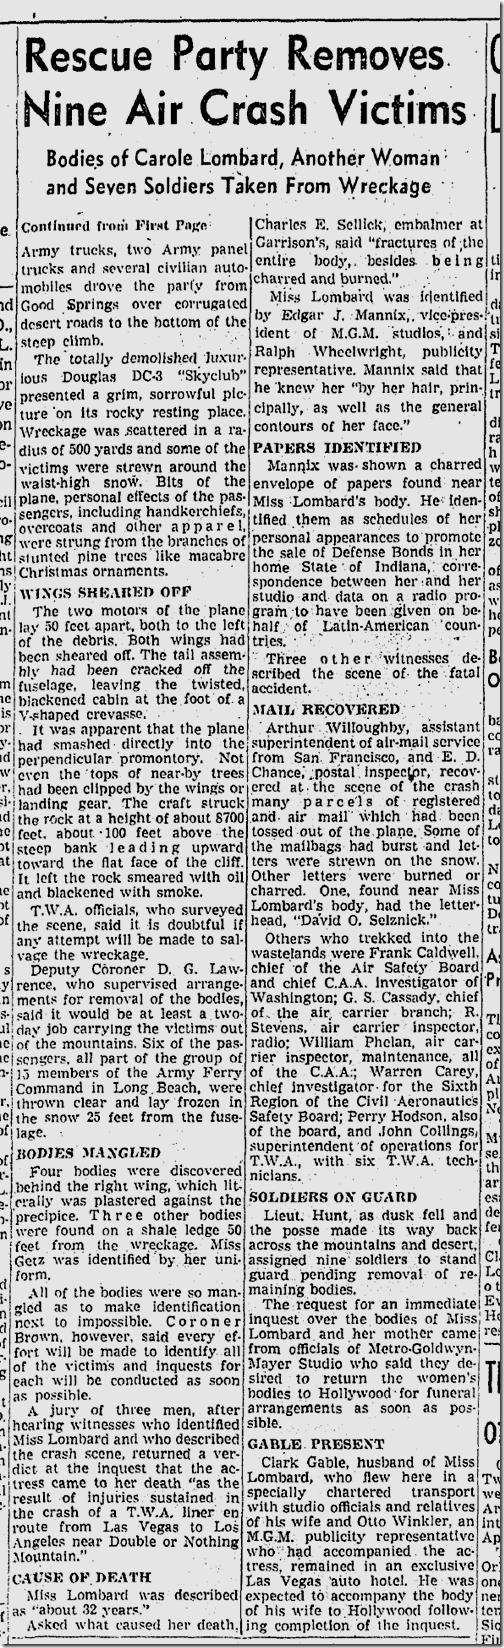 Jan. 19, 1942, Carole Lombard